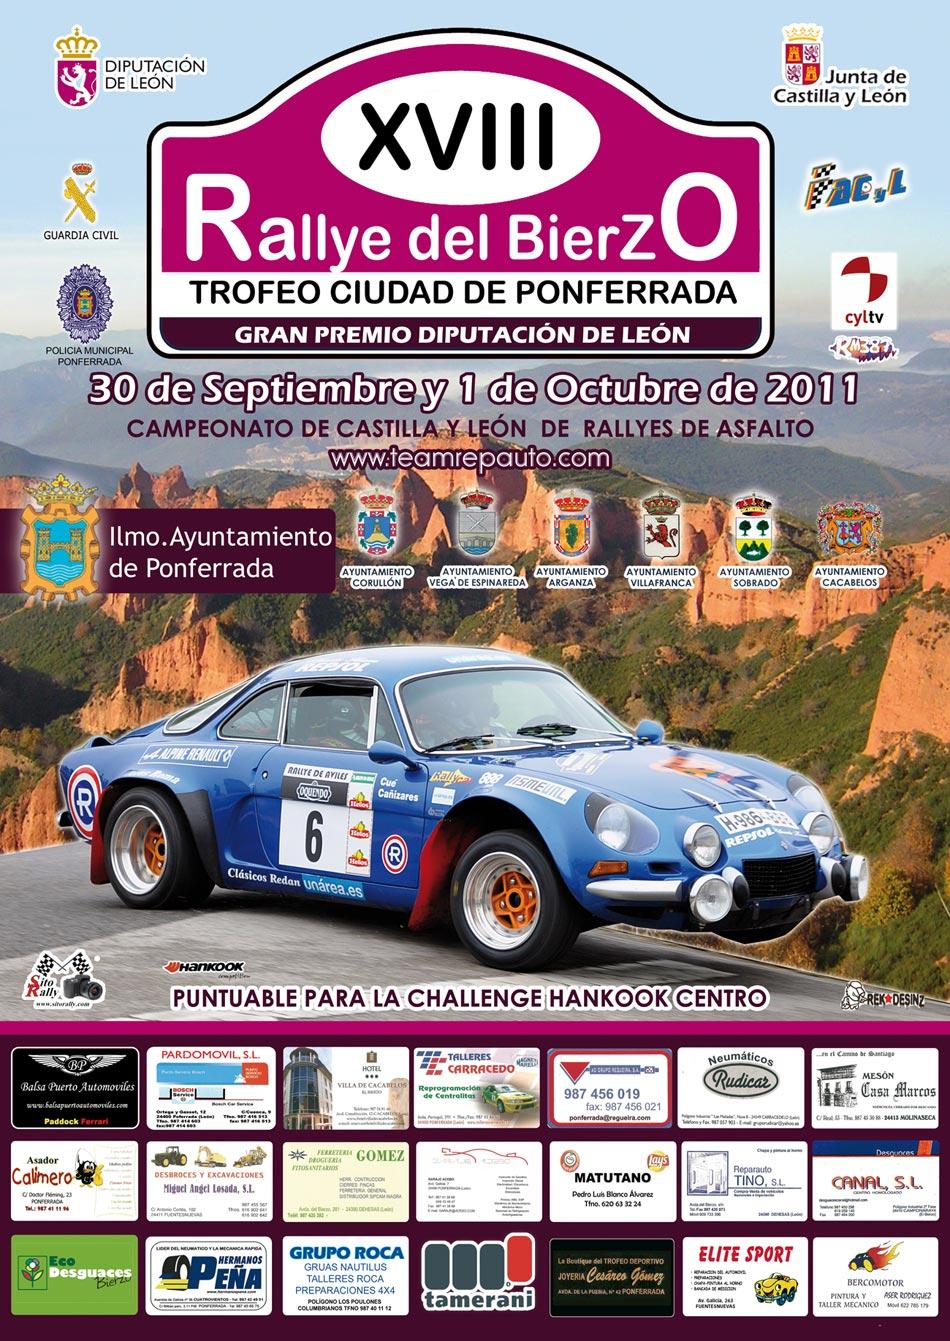 http://www.teamrepauto.com/webbierzo11/cartelbierzo11.jpg